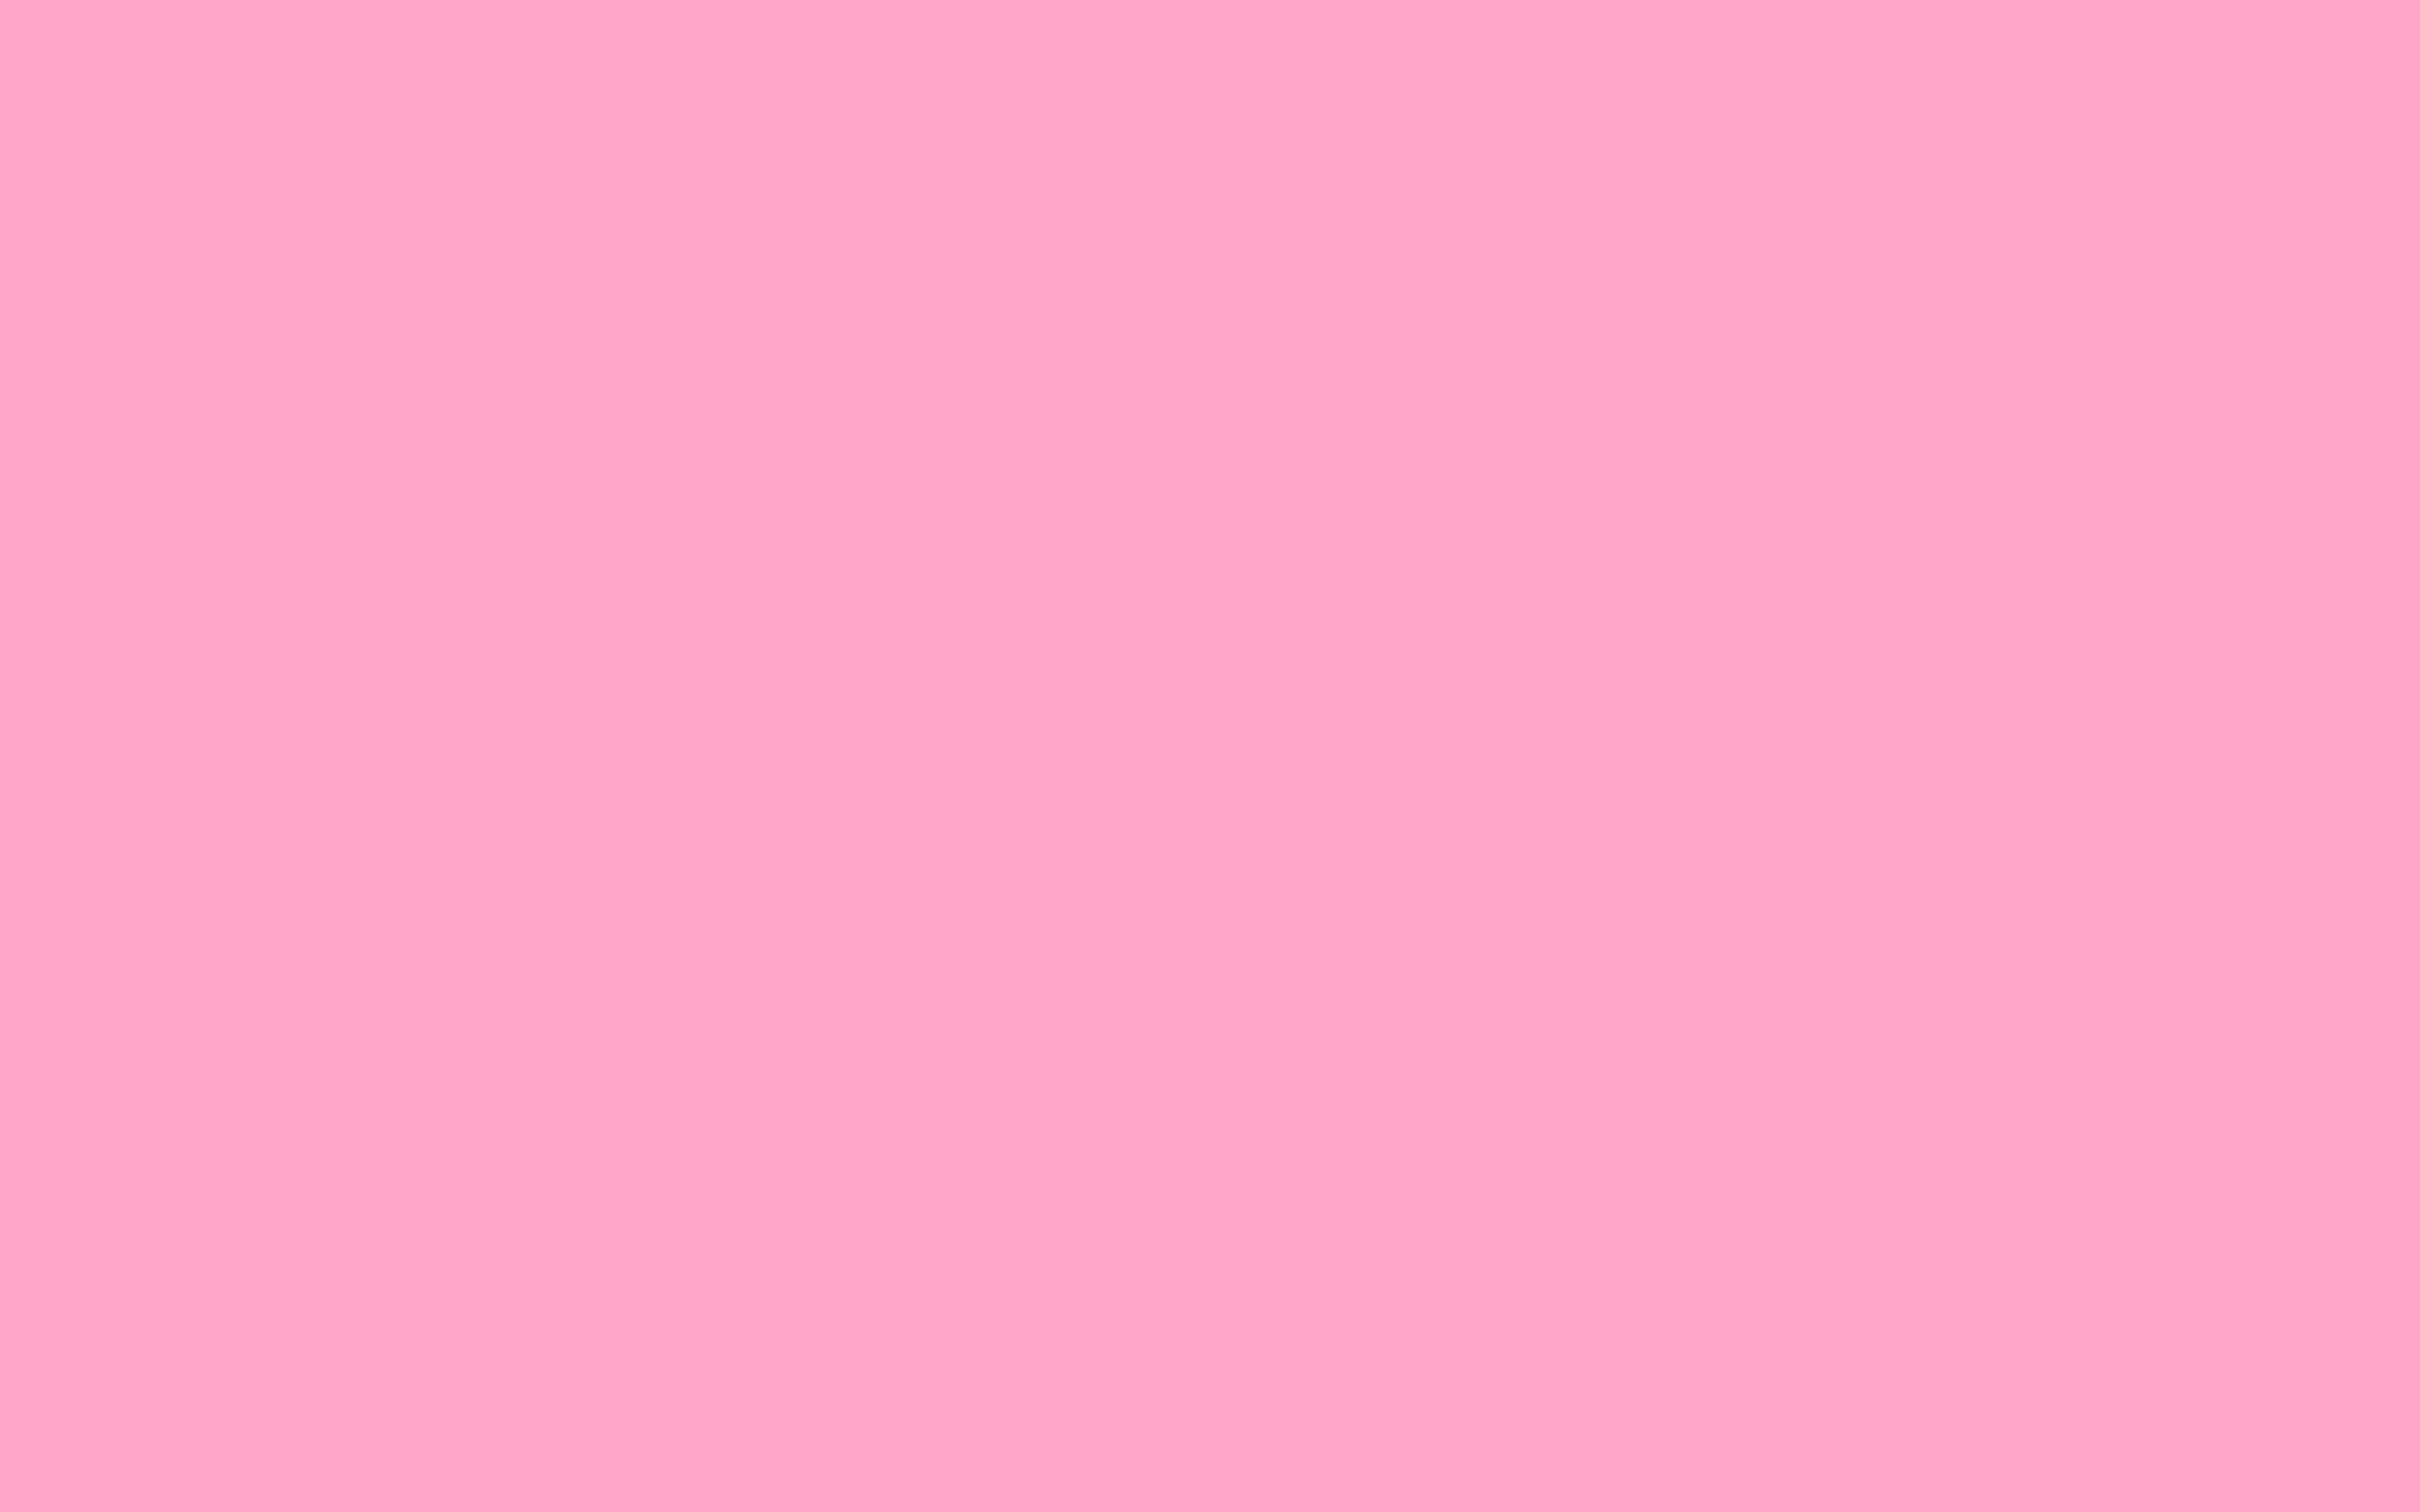 2560x1600 Carnation Pink Solid Color Background